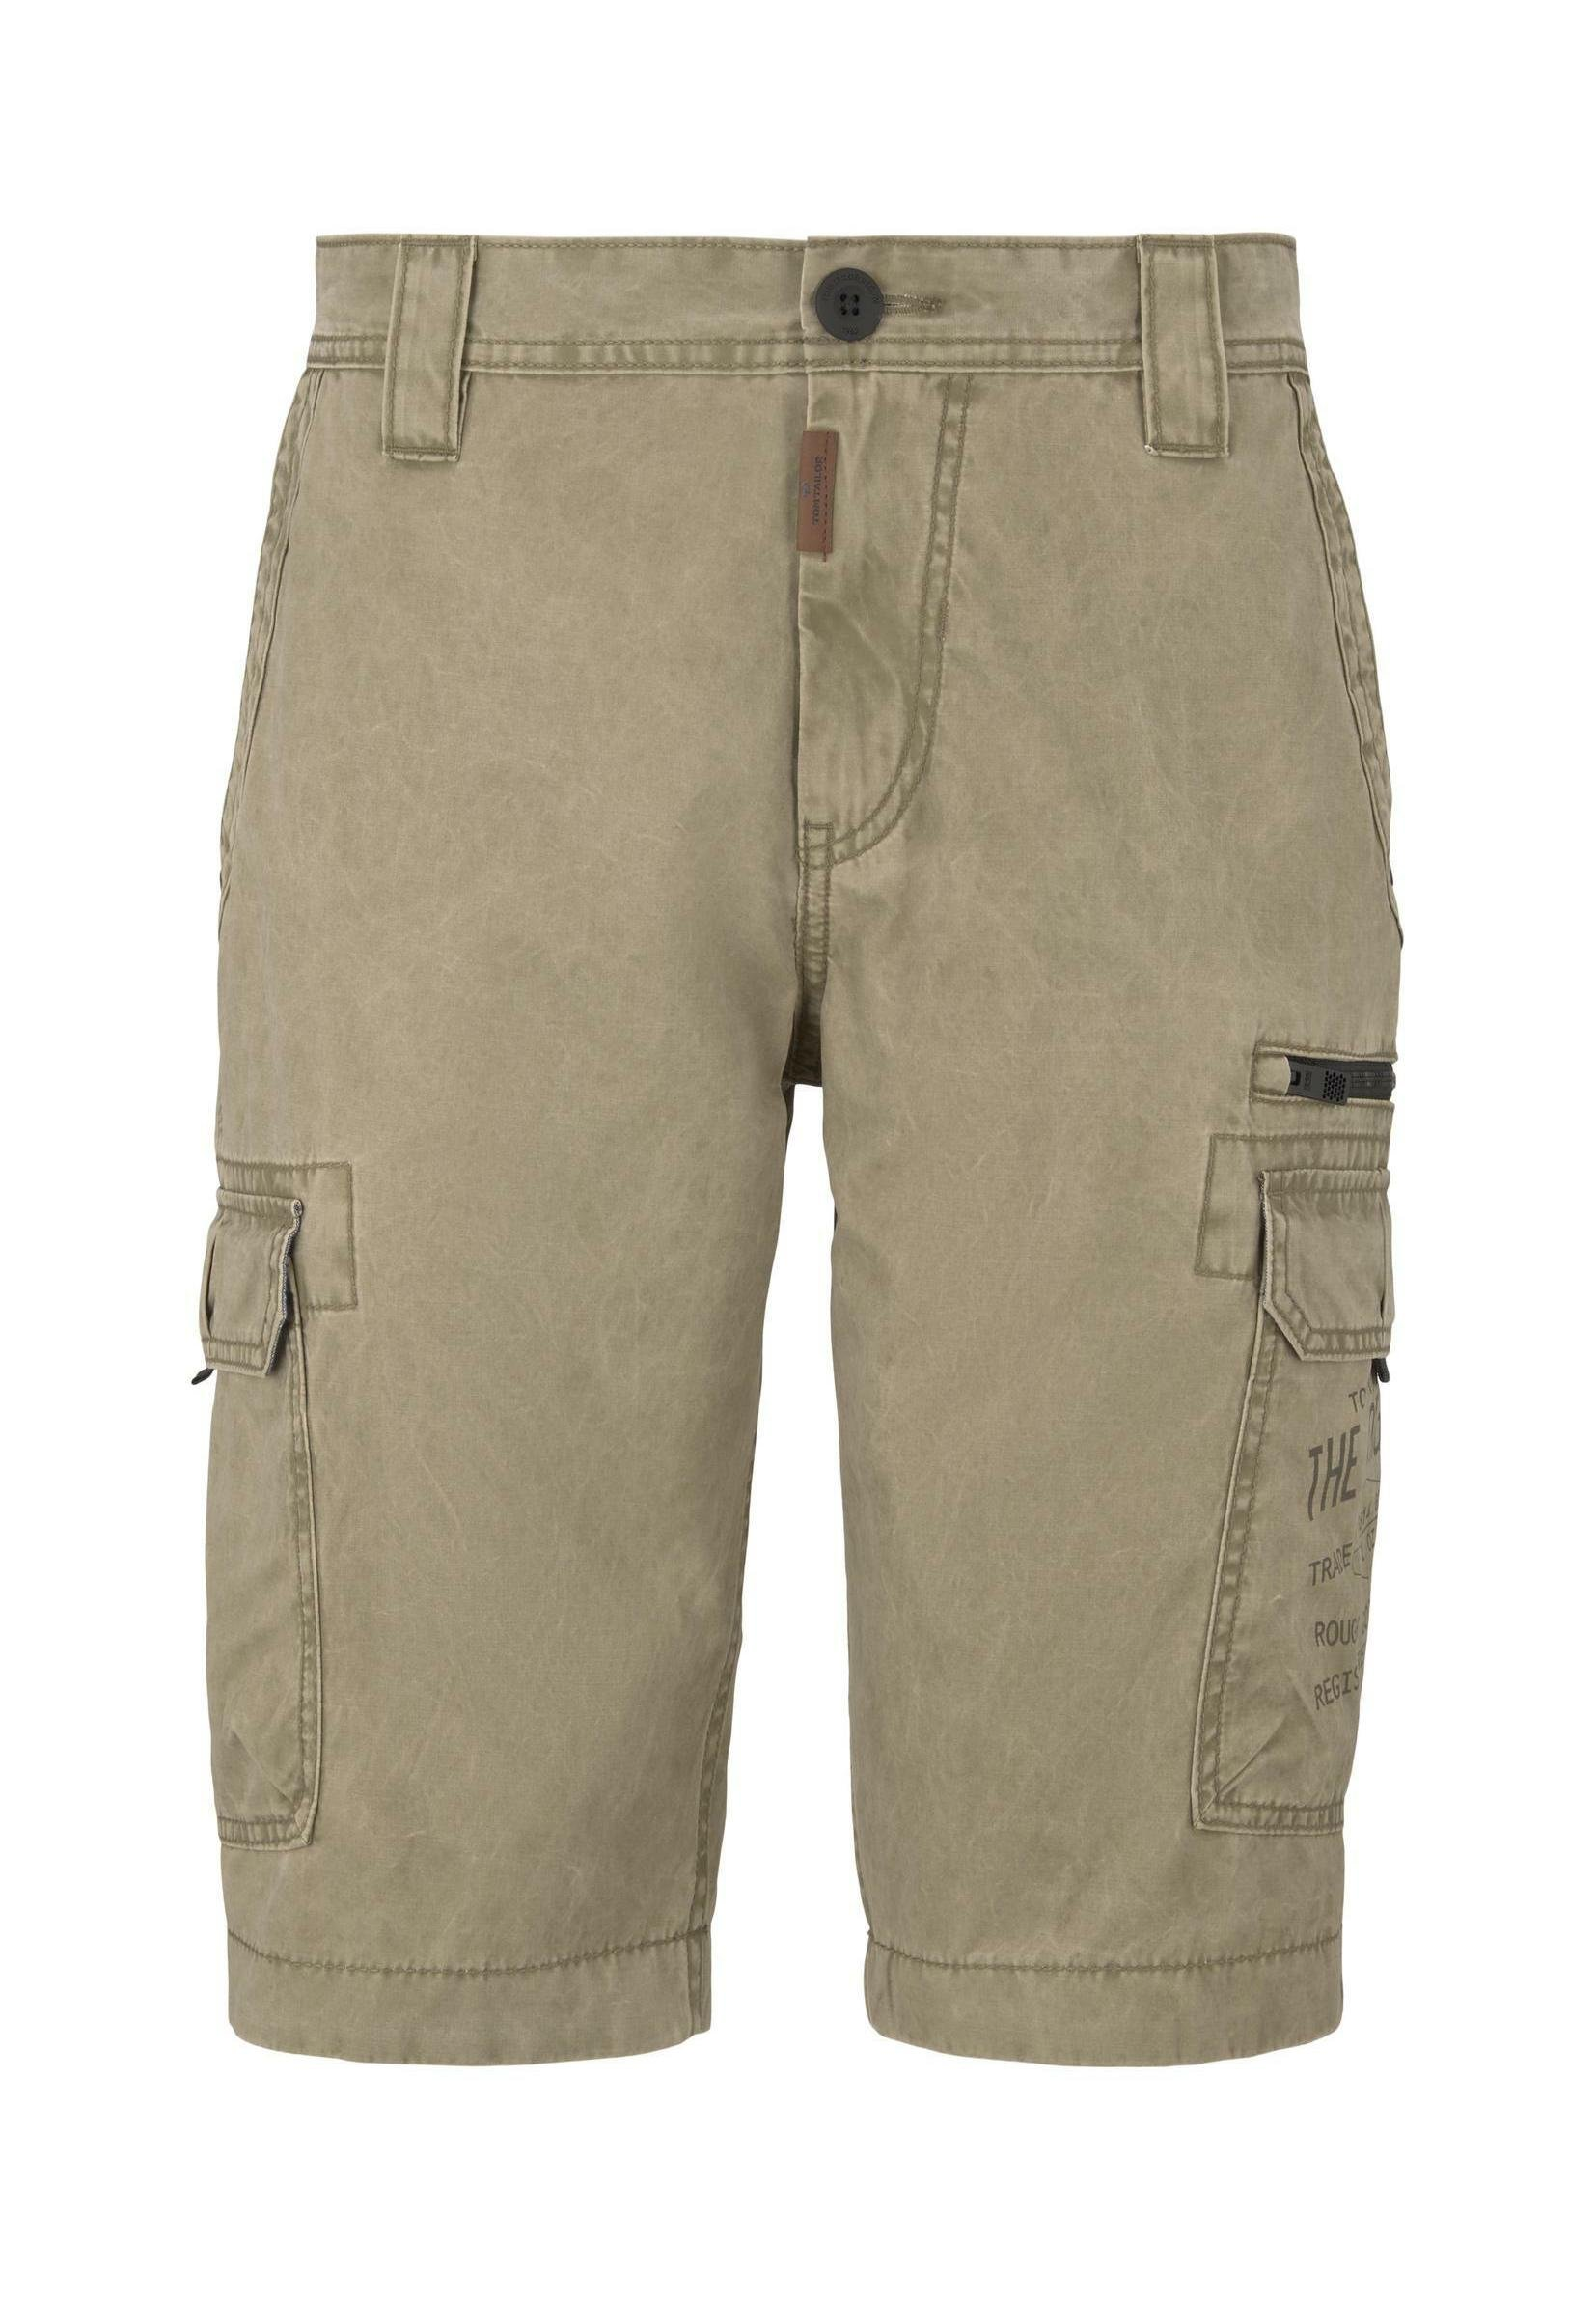 Tom Tailor Jeans Shorts - Blue Grey